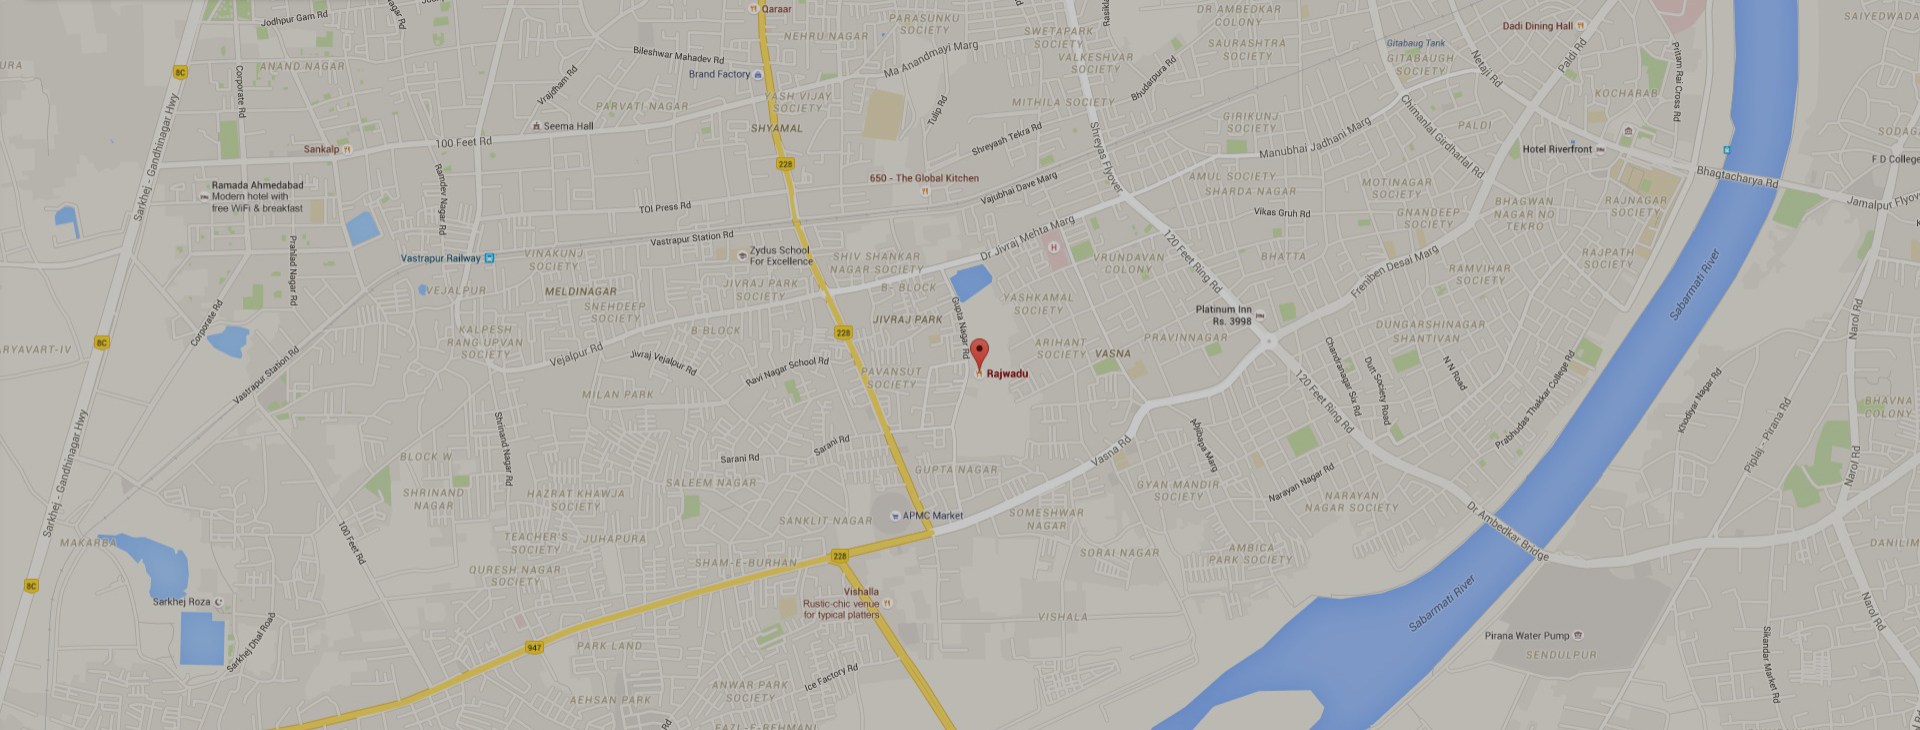 Ahmedabad City